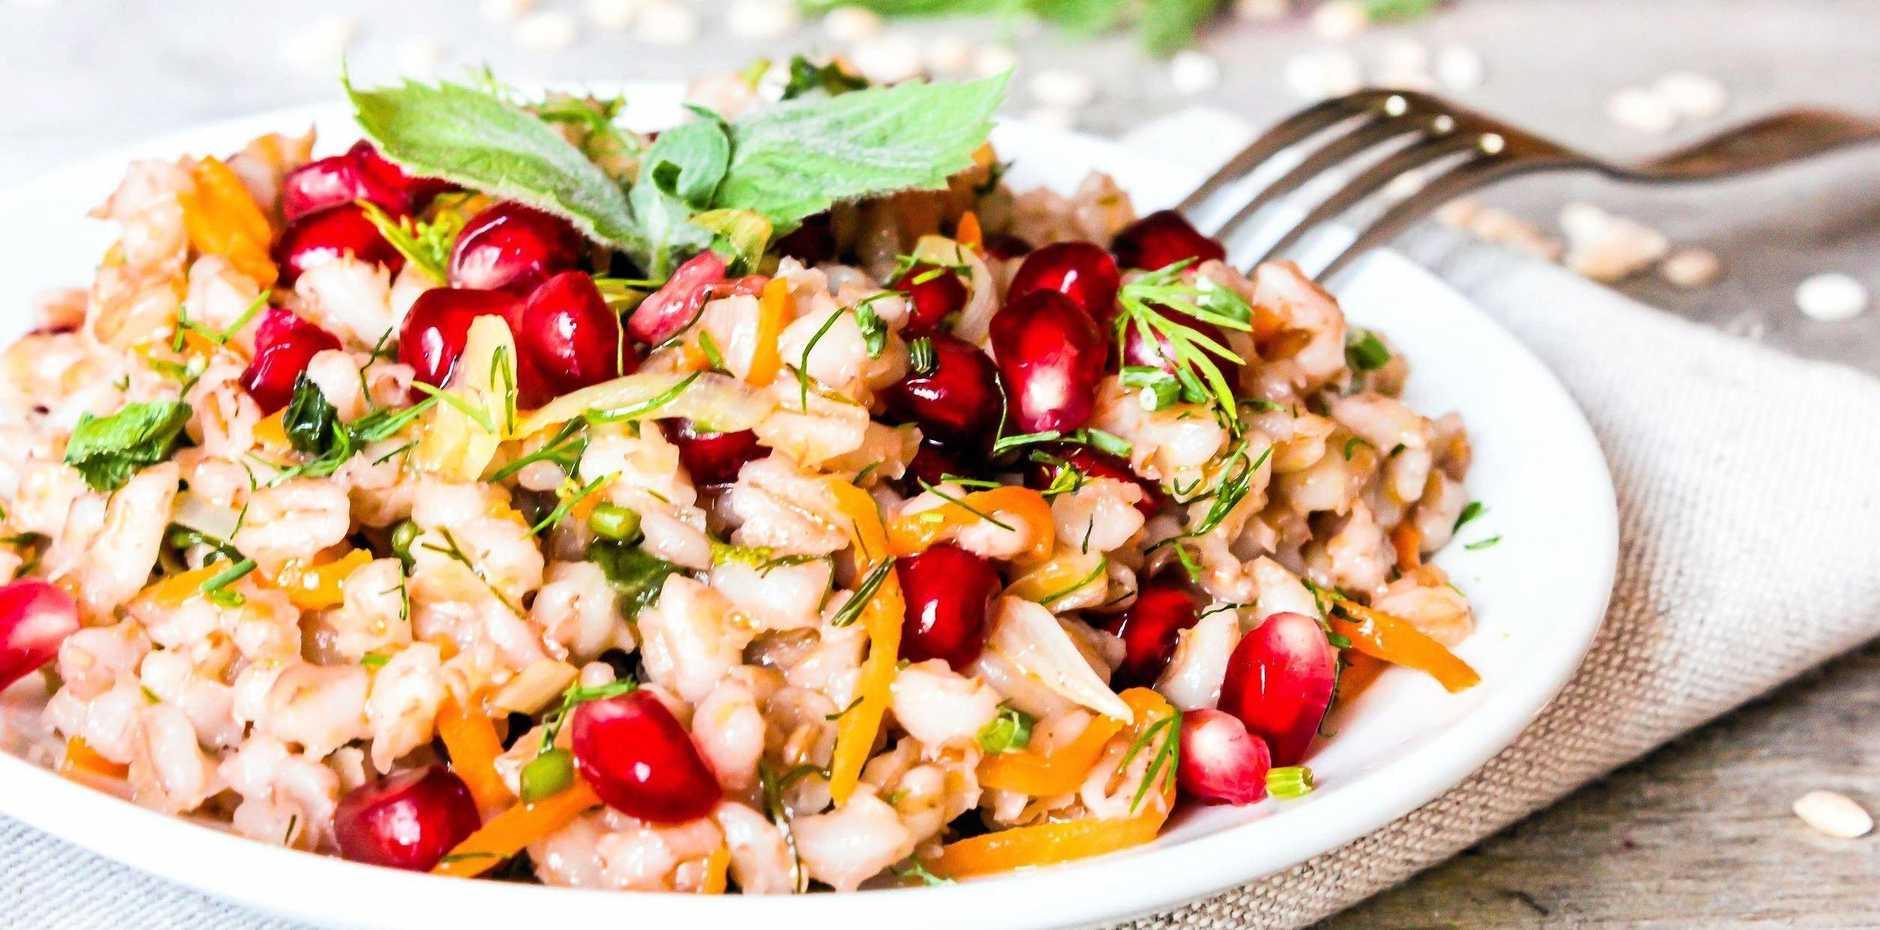 Maggie Cooper's barley pomegranate salad.